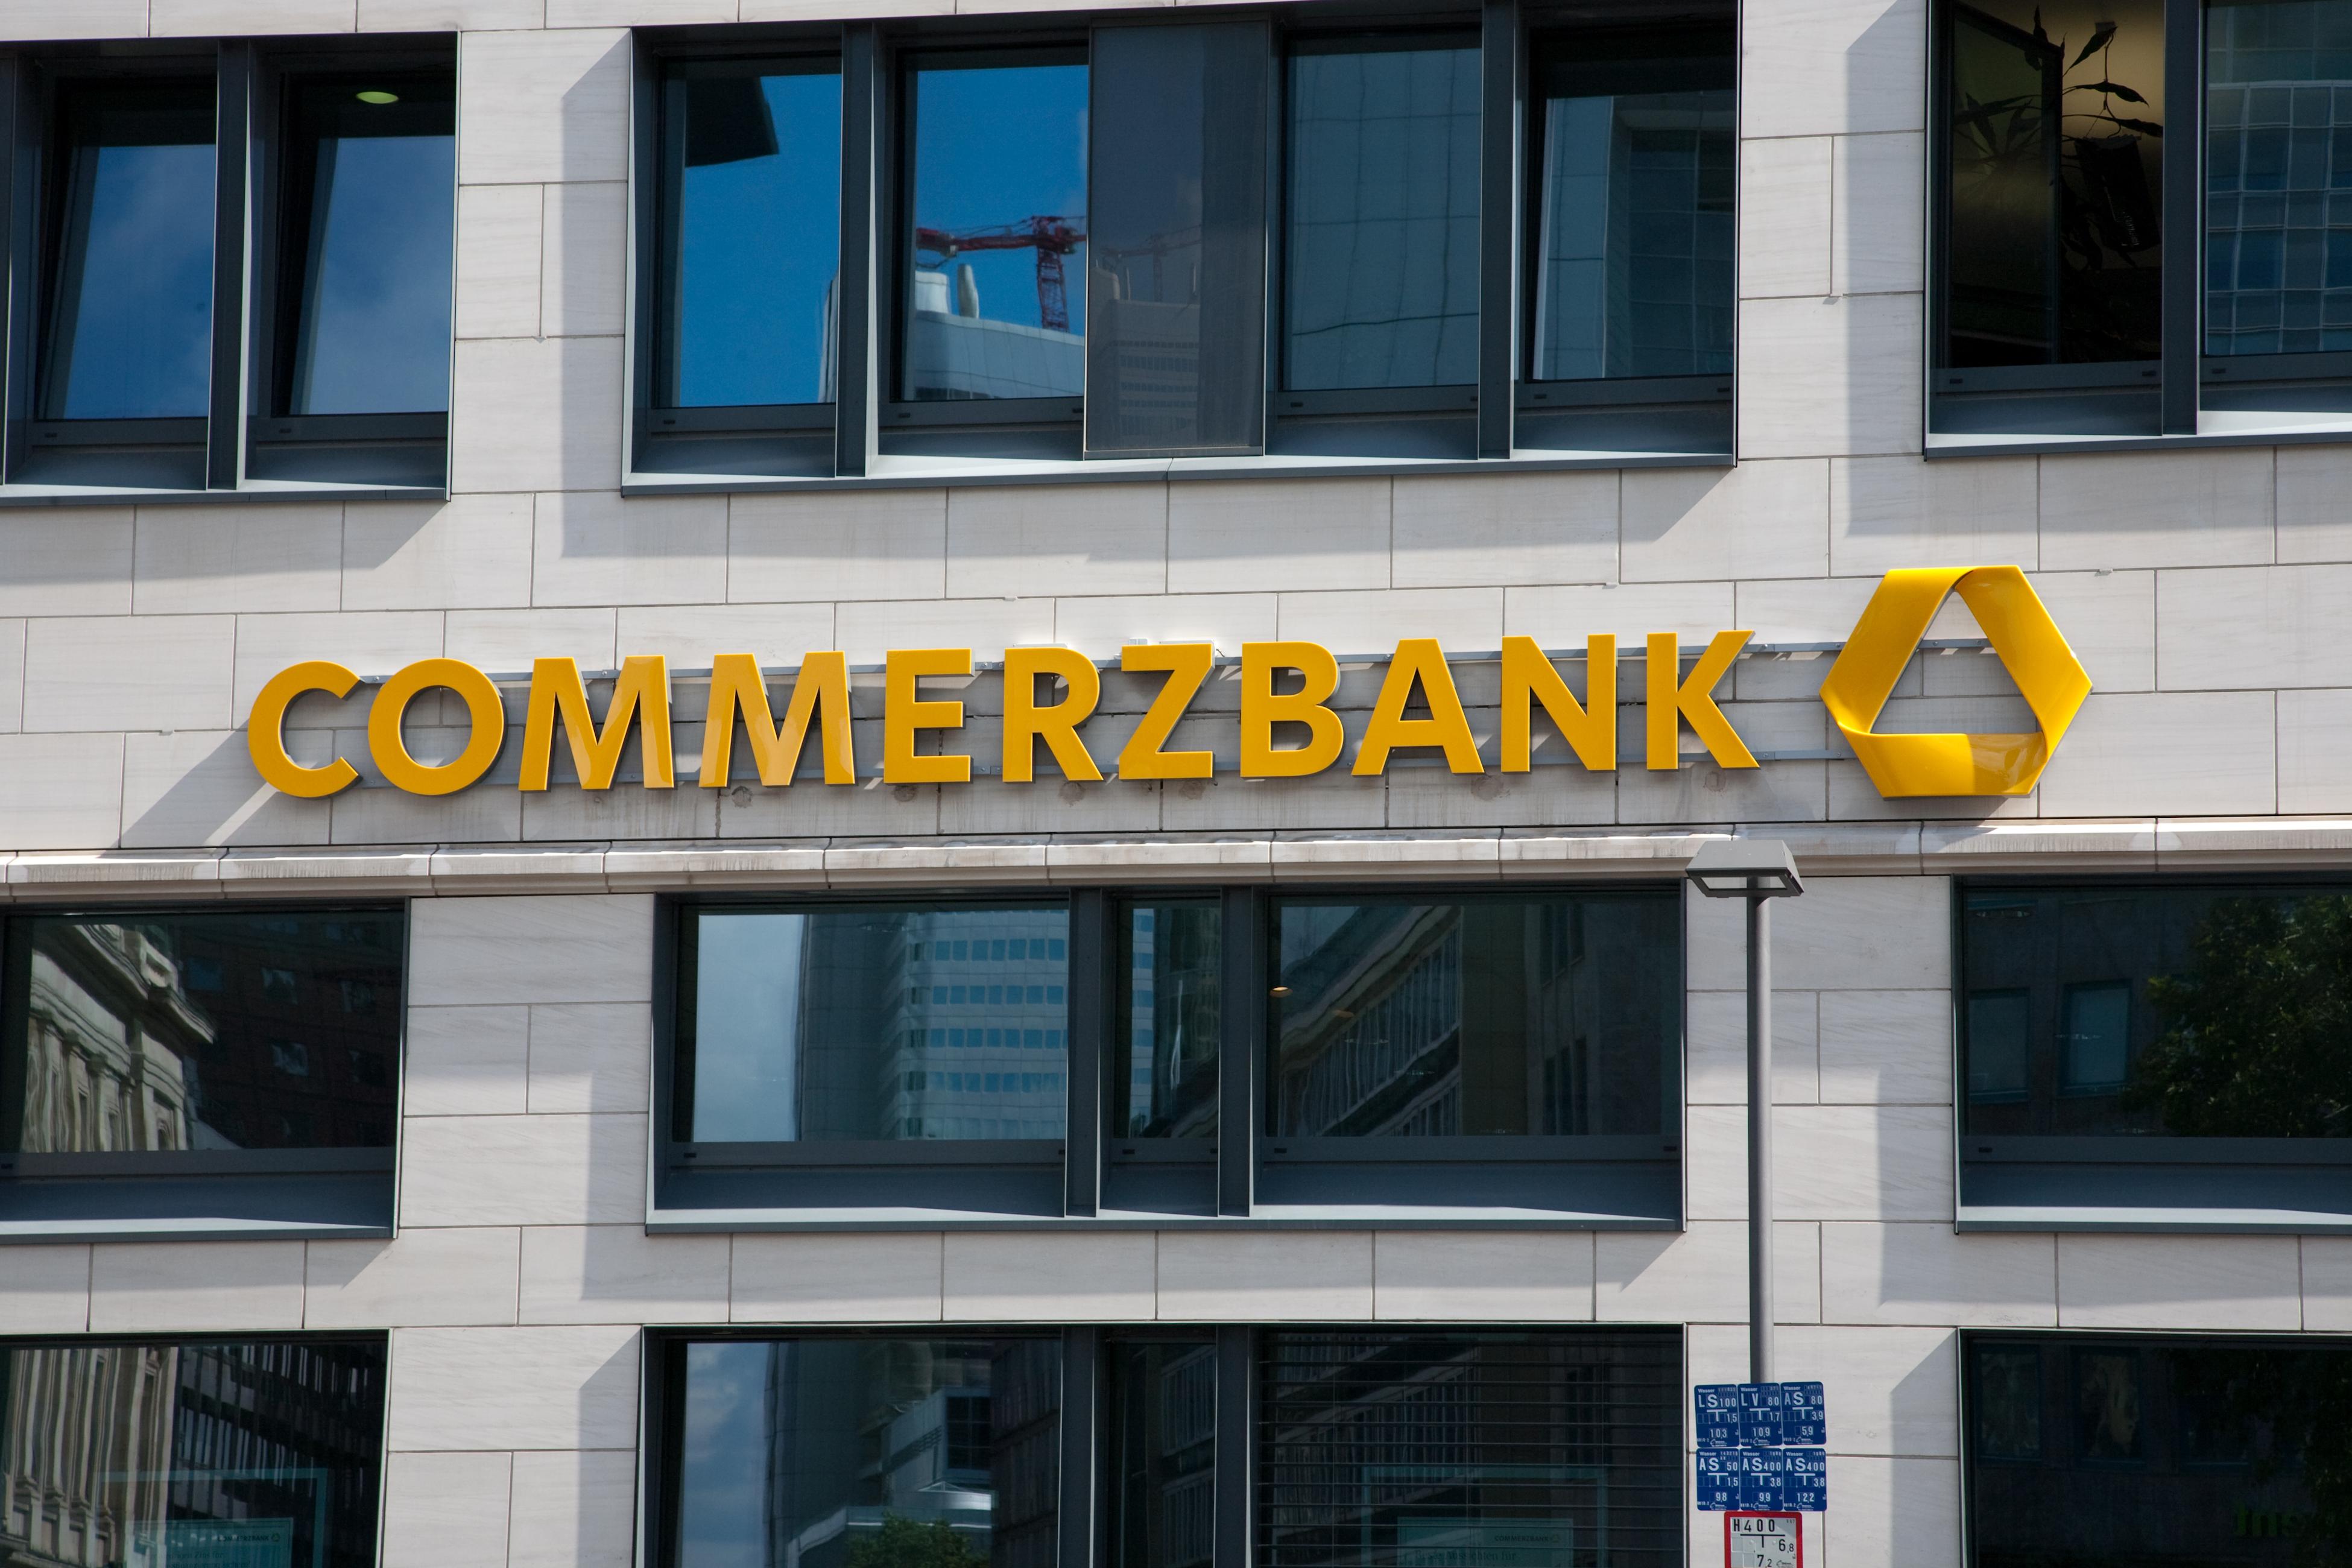 Commerzbanka Ktie